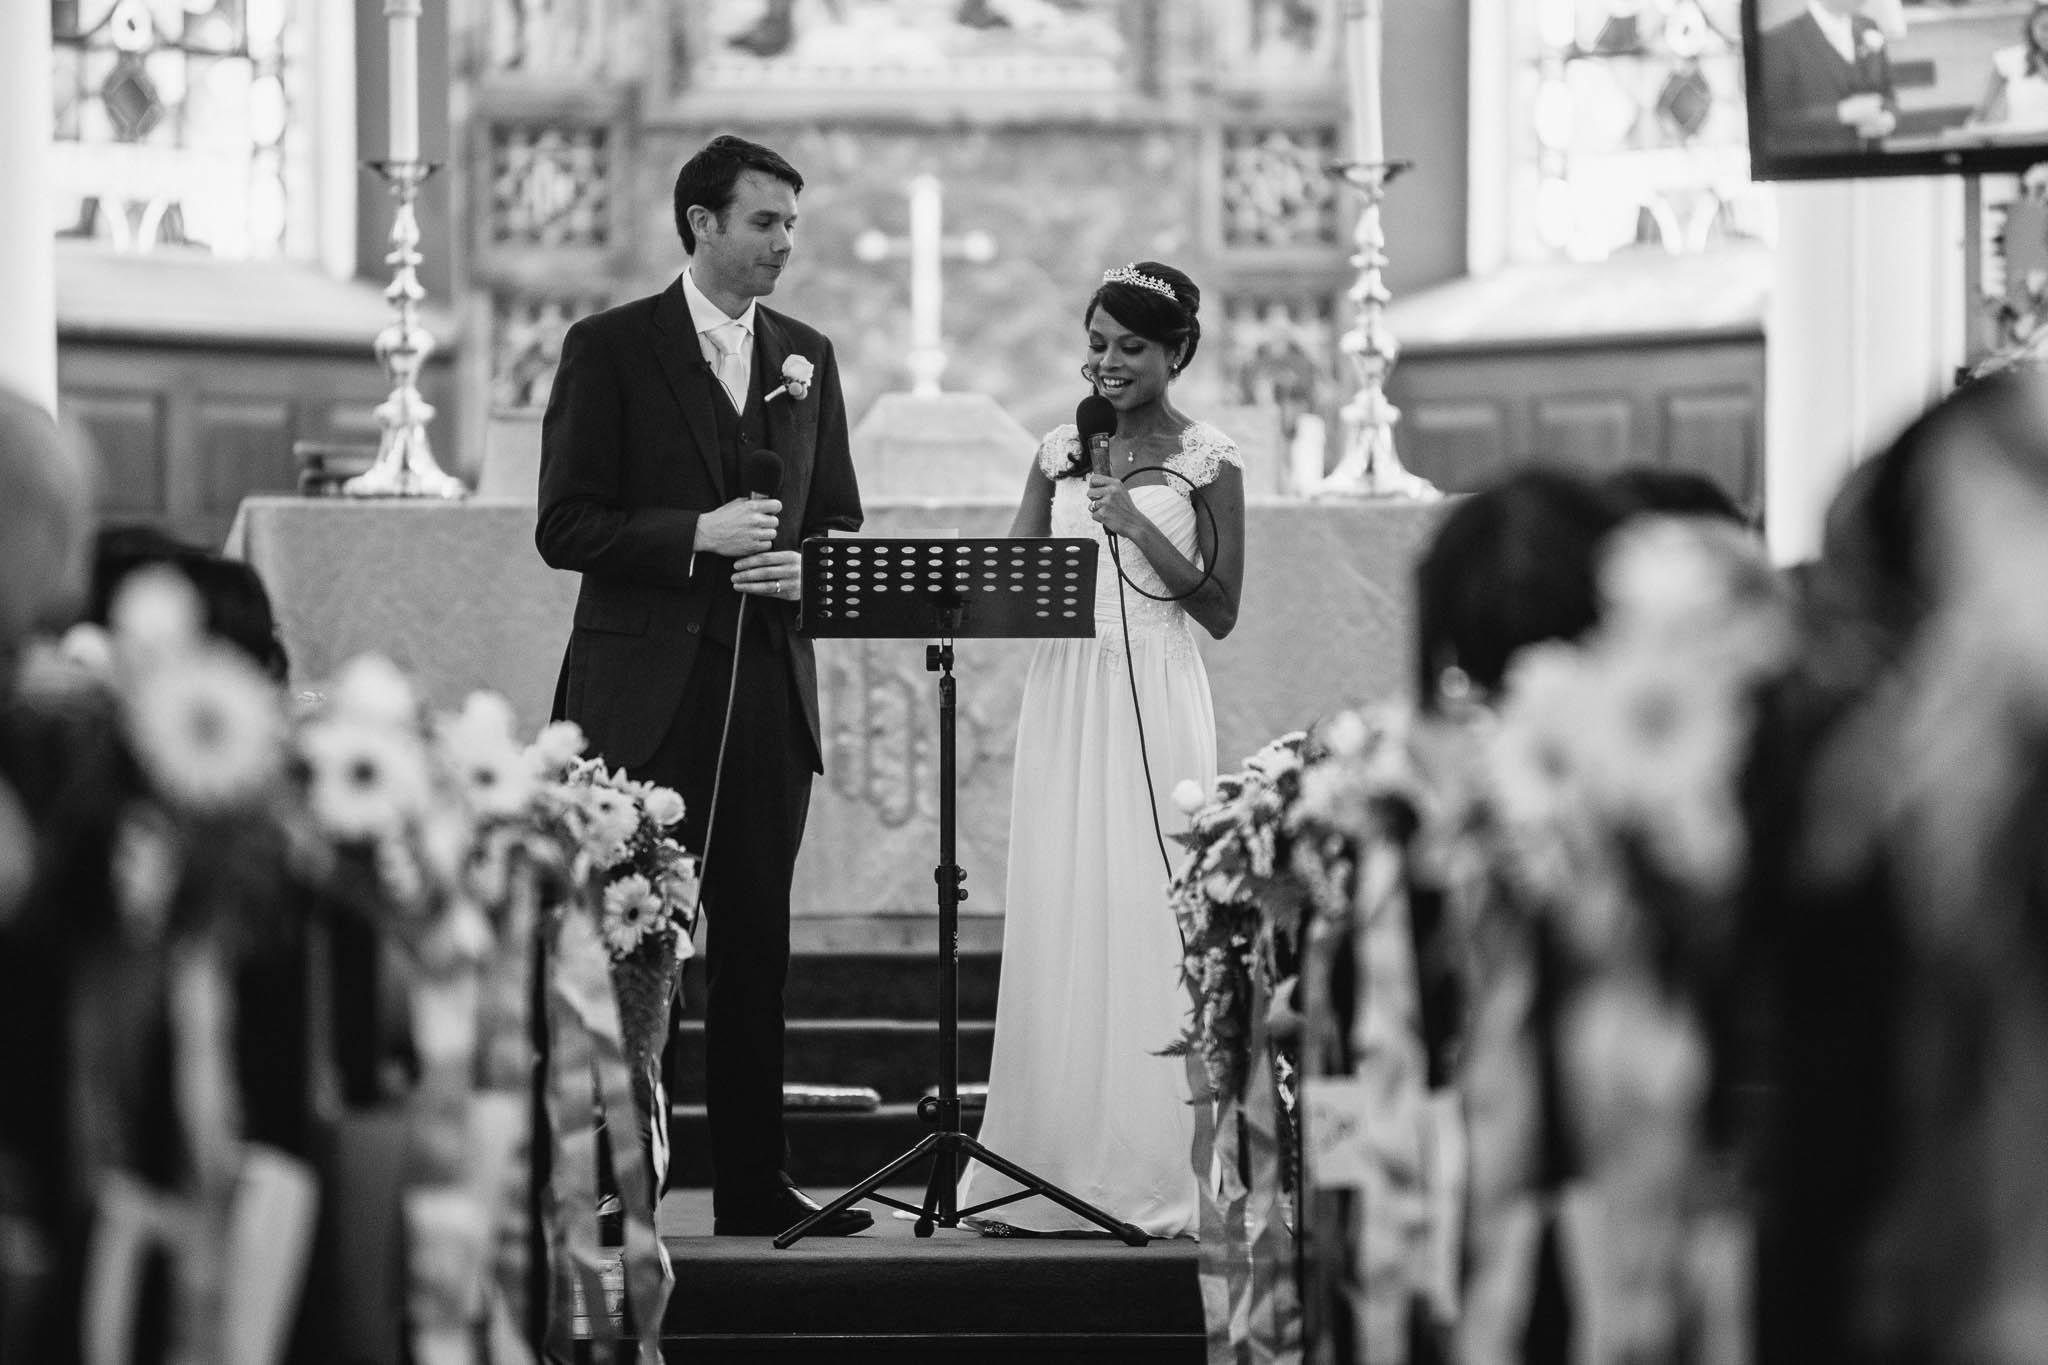 singapore-wedding-photographer-st-andrews-cathedral-renita-david-24.jpg